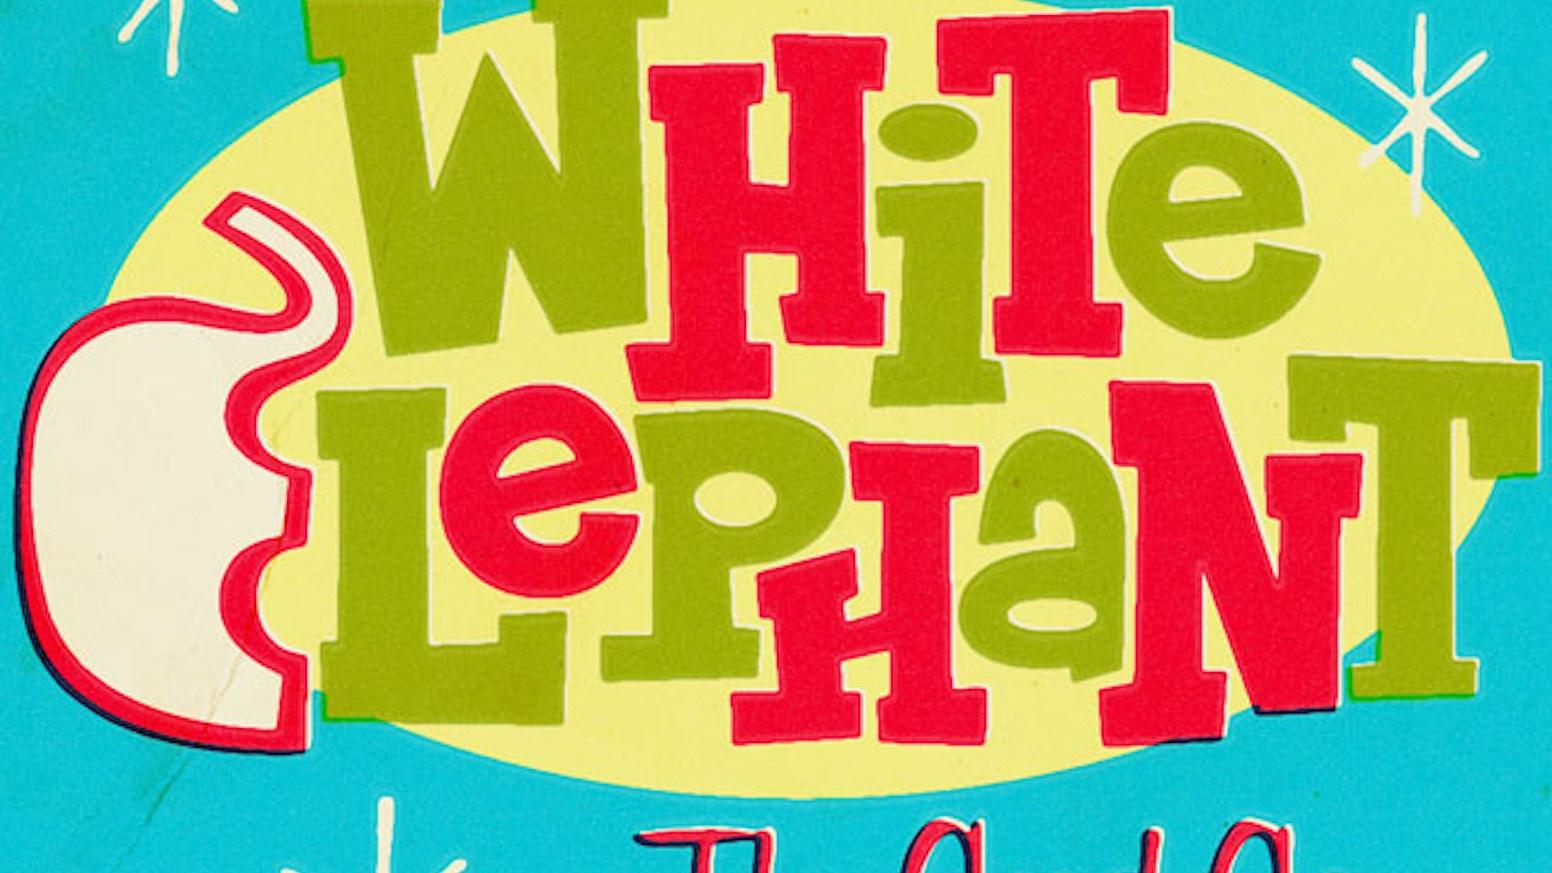 white elephant card game by brian kelley kickstarter - Christmas White Elephant